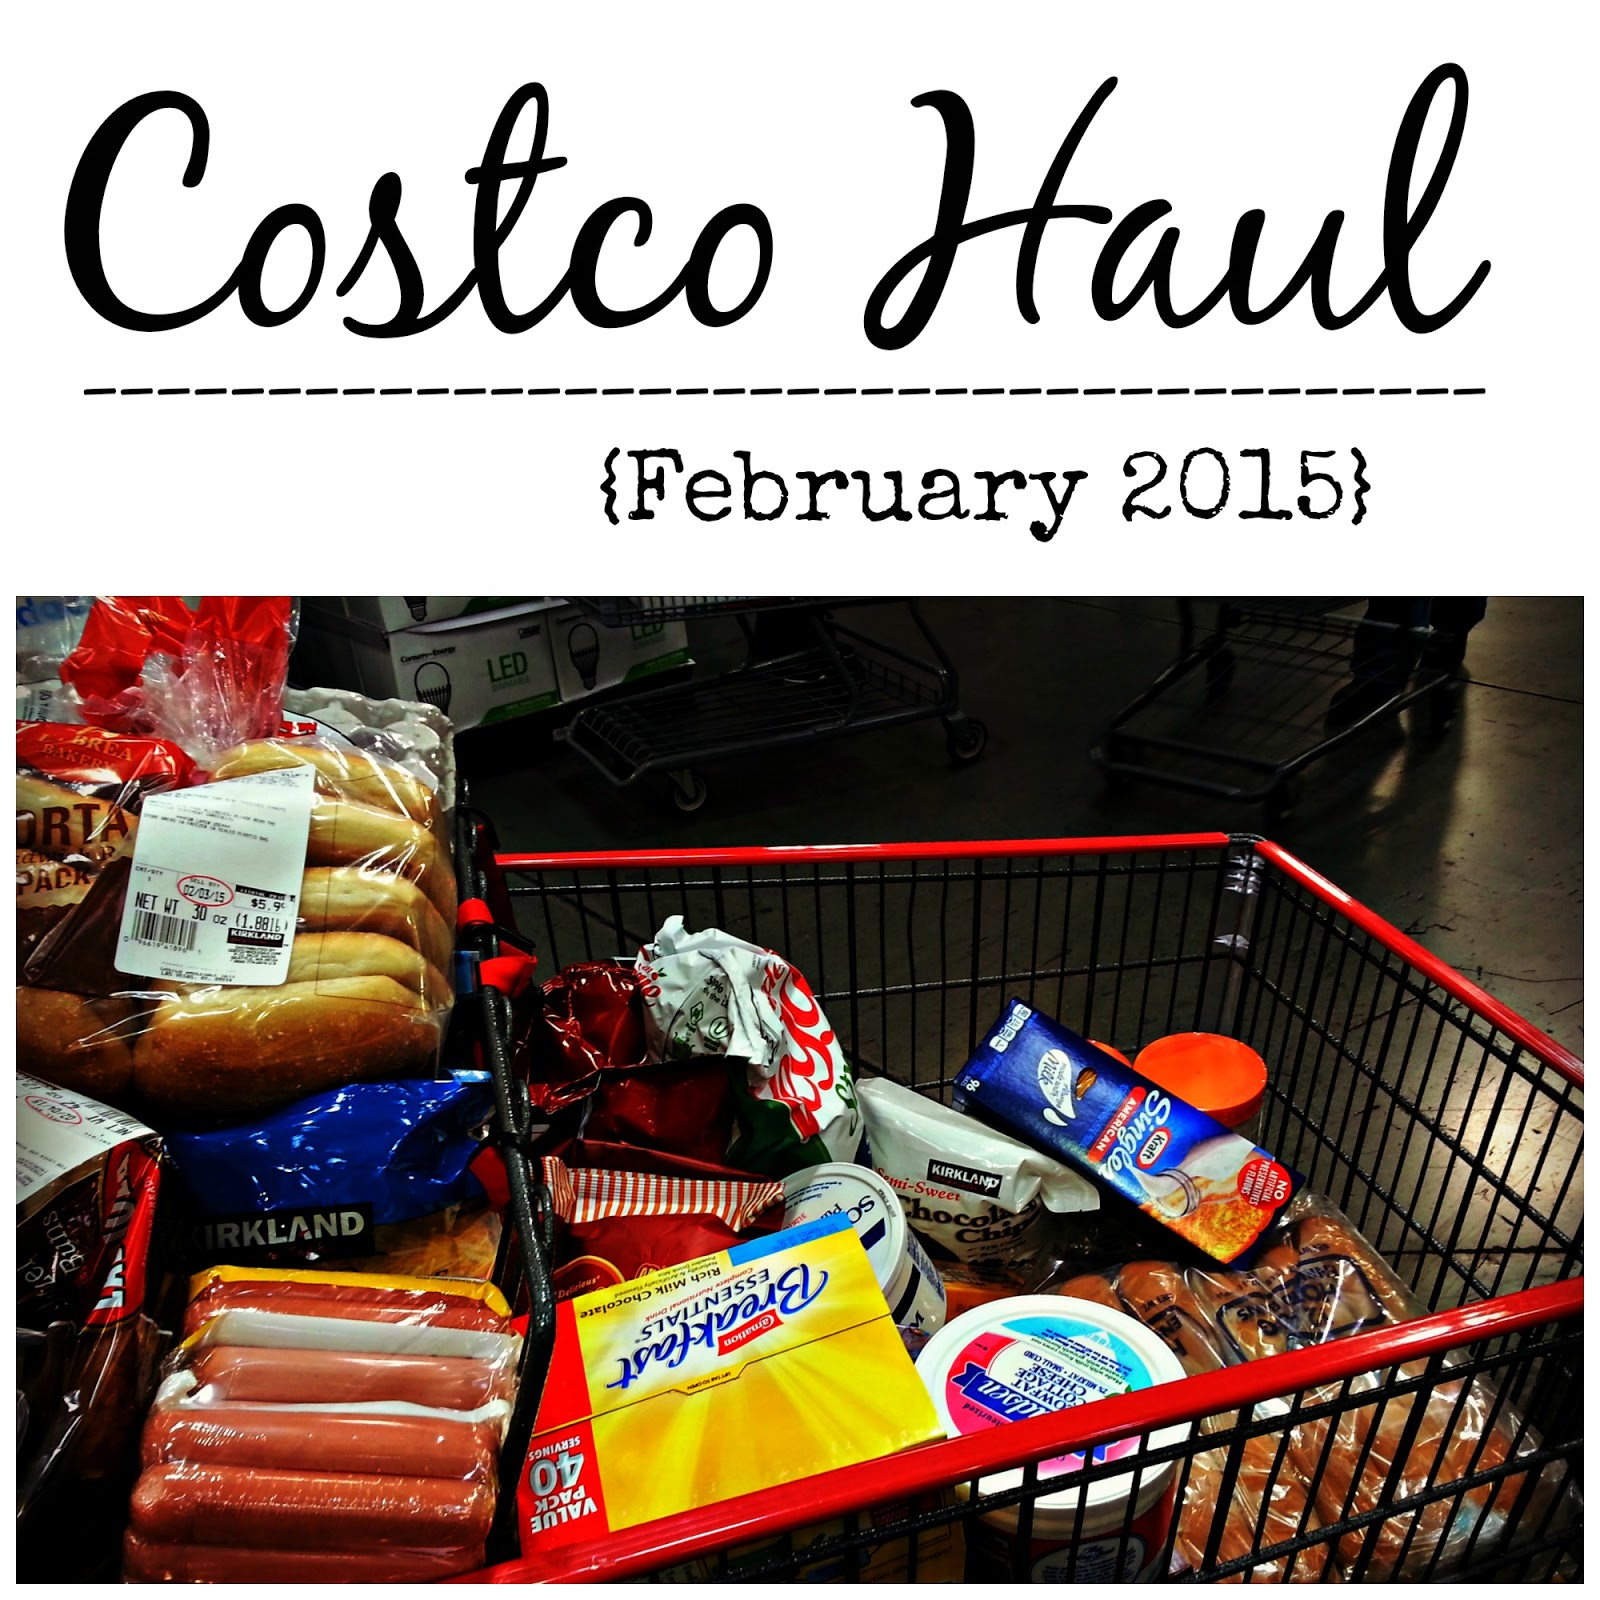 Costco Grocery Haul February 2015 -- VIDEO